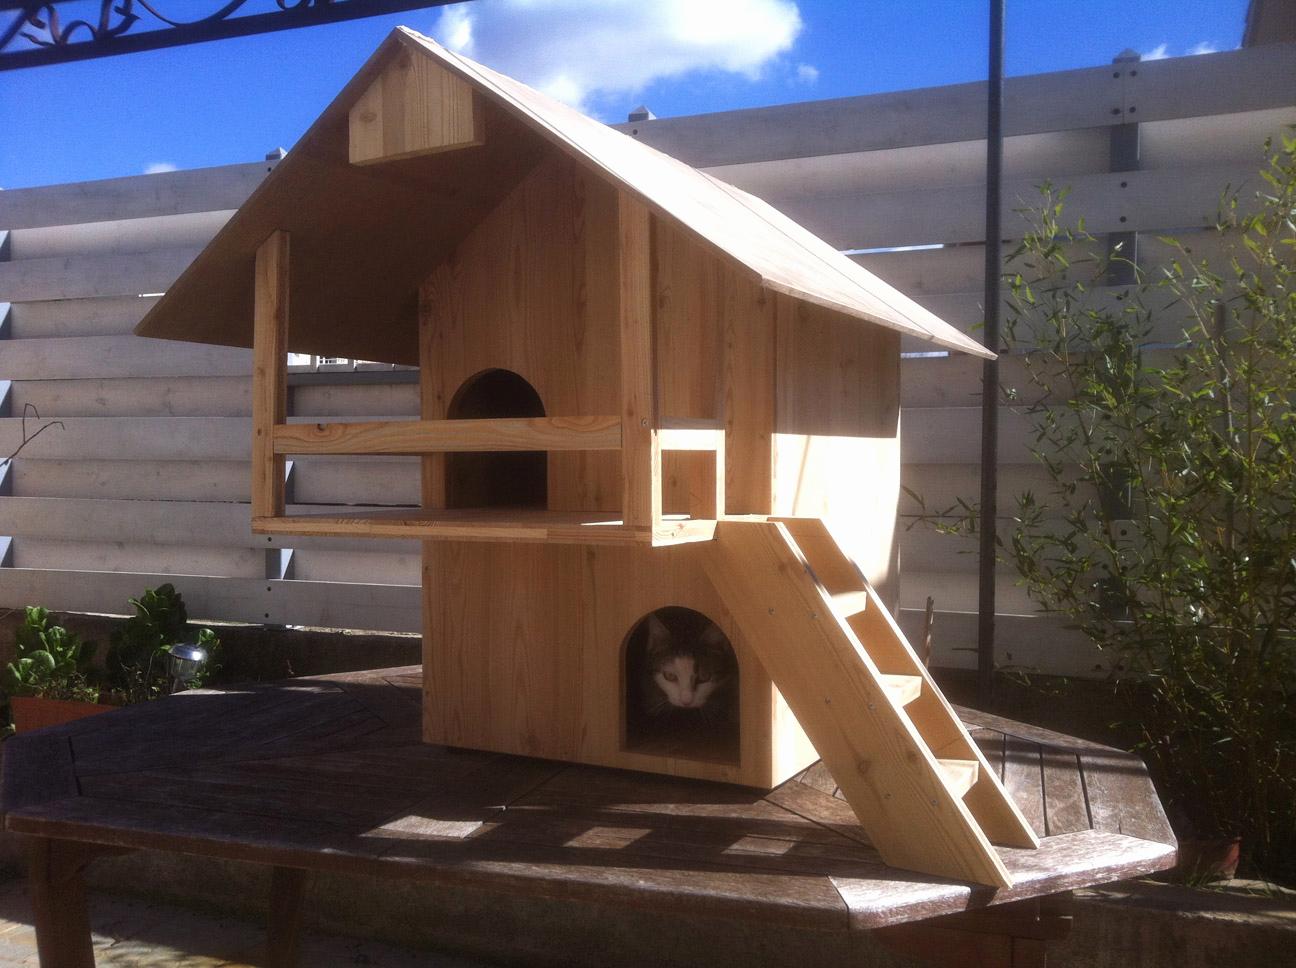 cabane pour chat pas cher jardin piscine et cabane. Black Bedroom Furniture Sets. Home Design Ideas